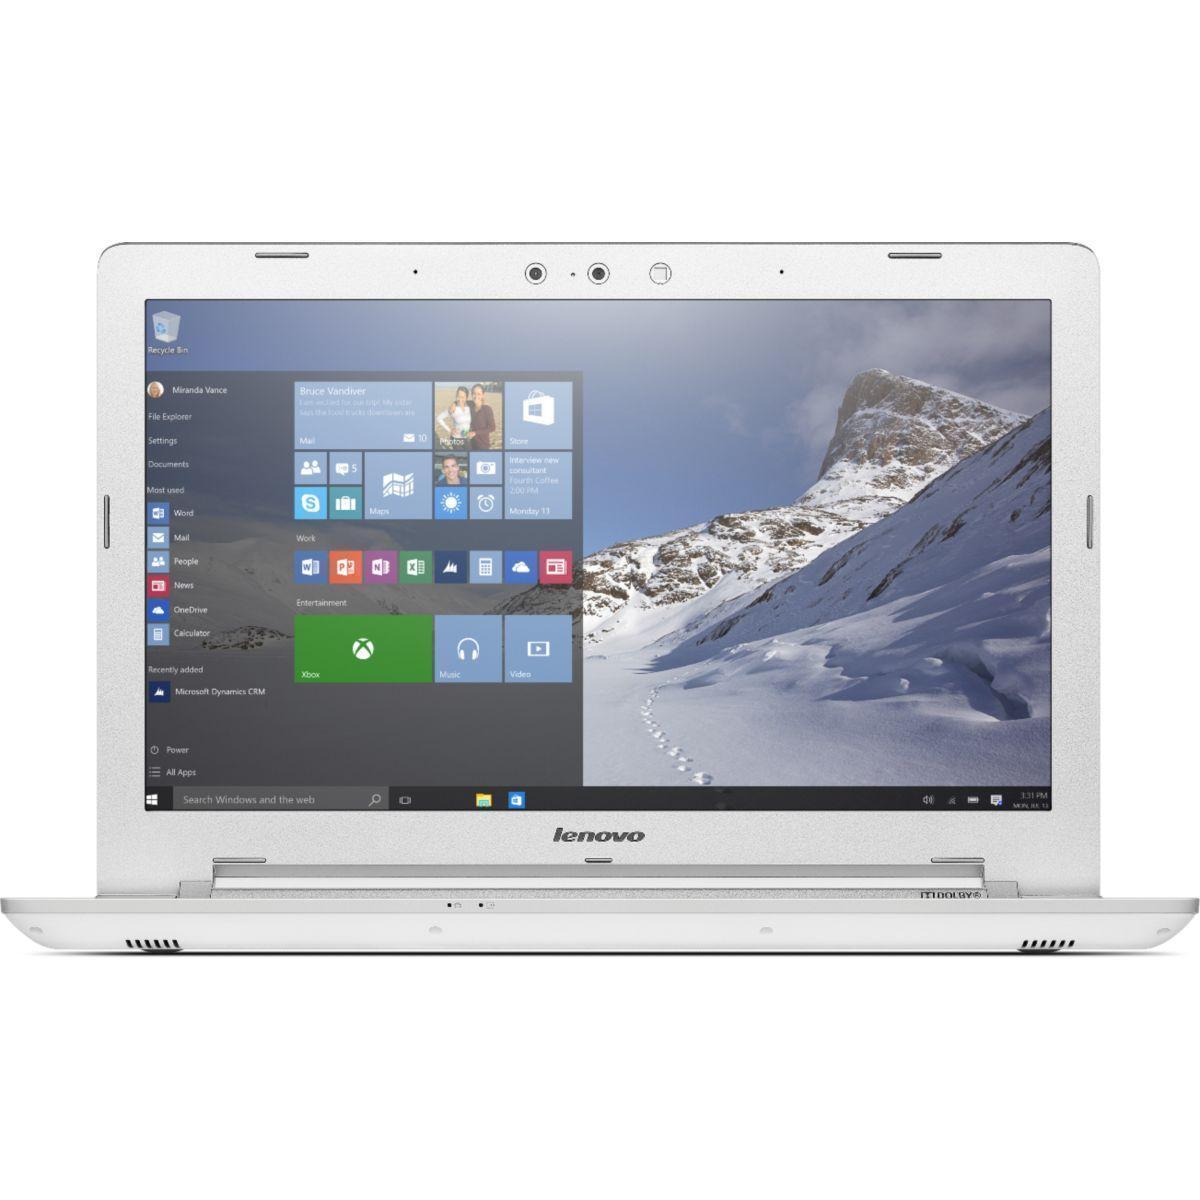 "Lenovo Z51-70 15"" Core i3 2 GHz - HDD 1 TB - 4GB Tastiera Francese"